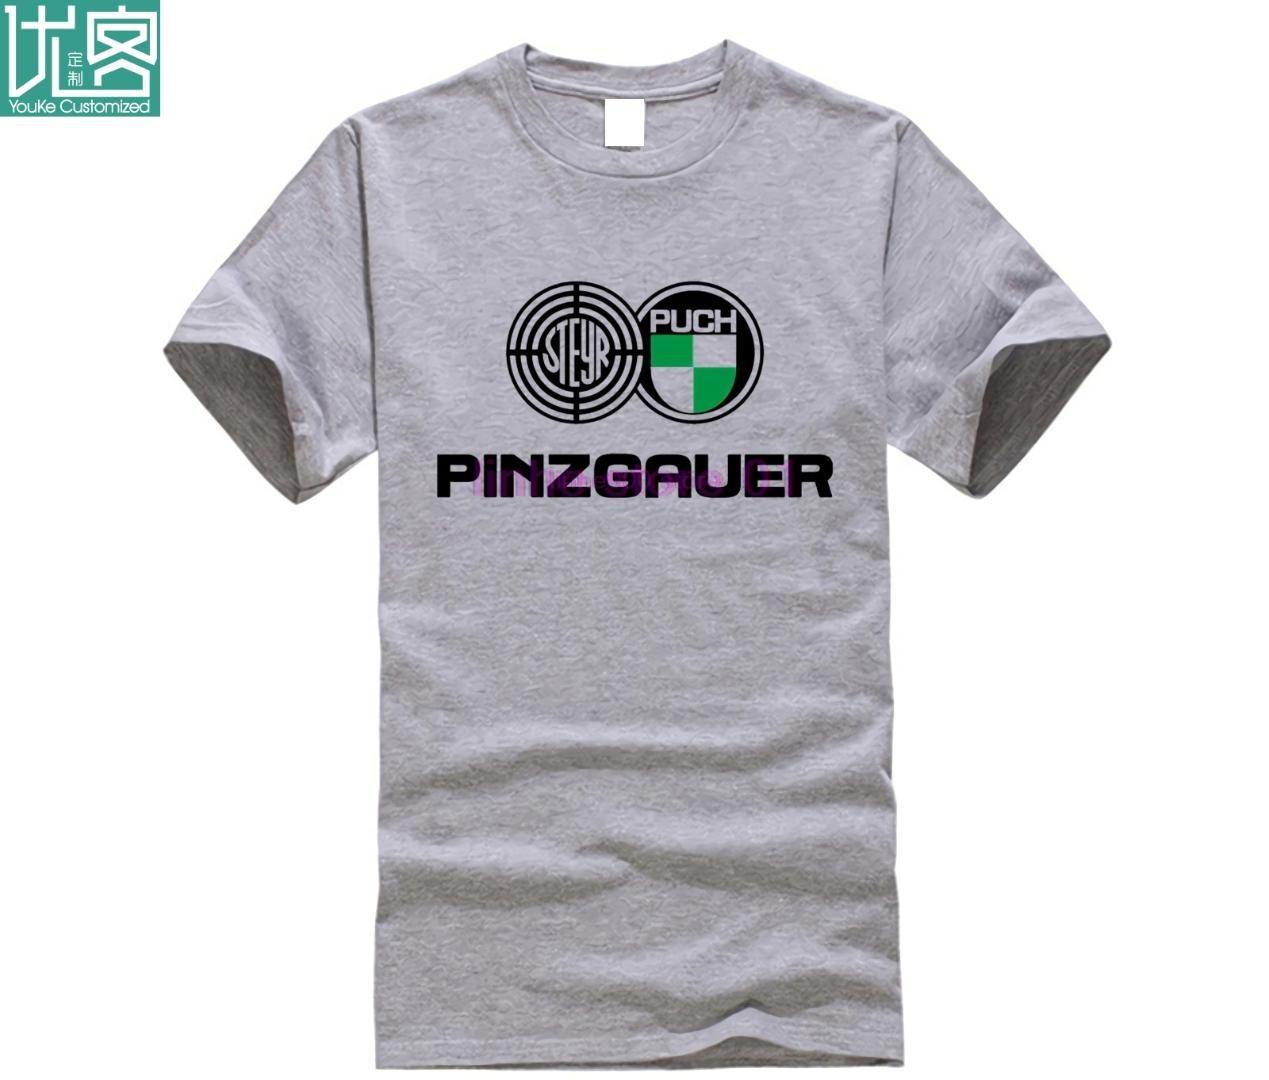 Pinzgauer Steyr Puch T-Shirt S-5XL Choose Color